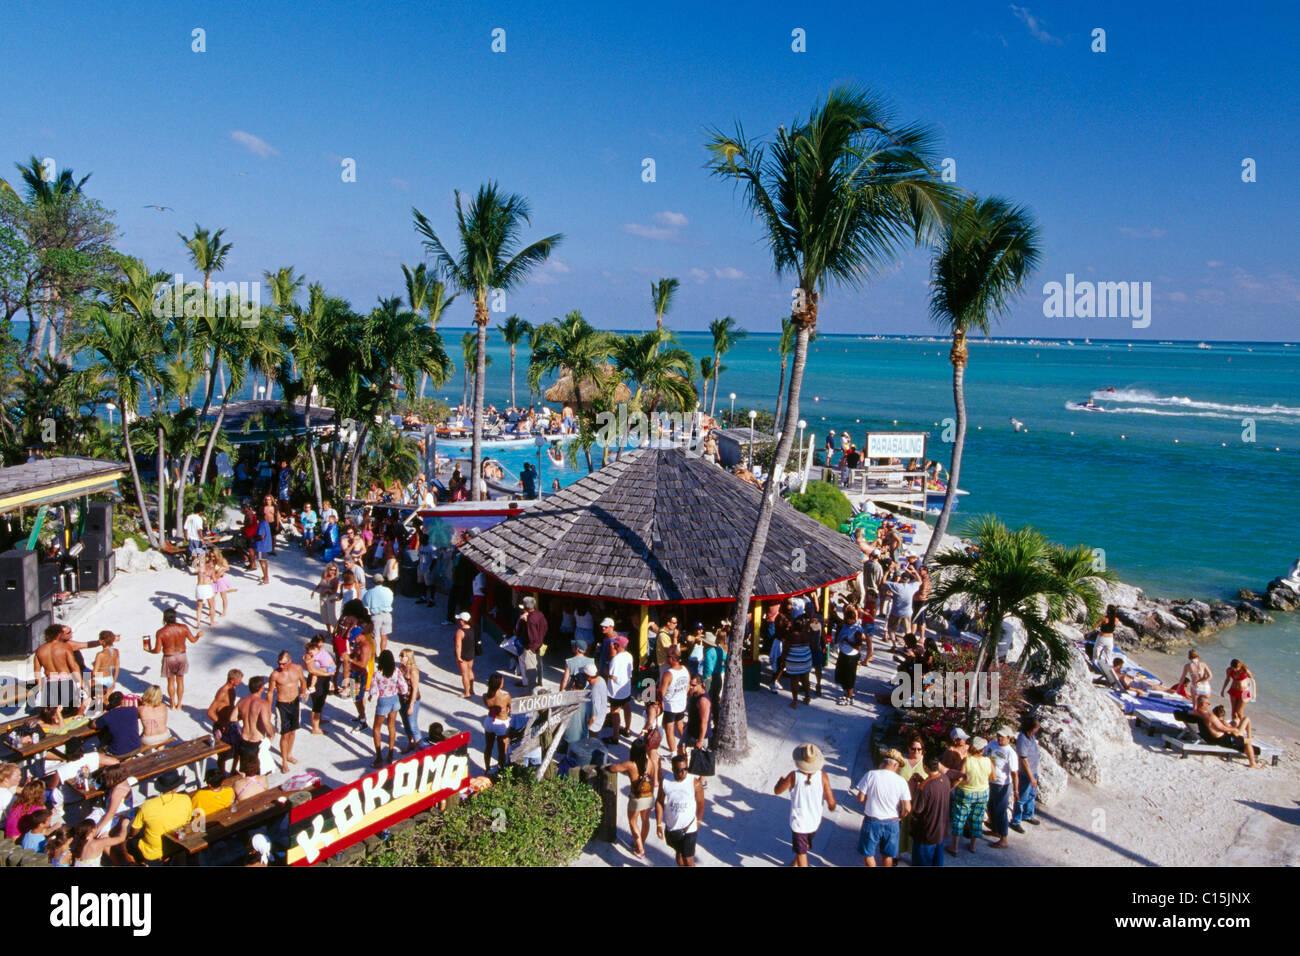 Islamorada stock photos islamorada stock images alamy for Florida keys fishing resorts